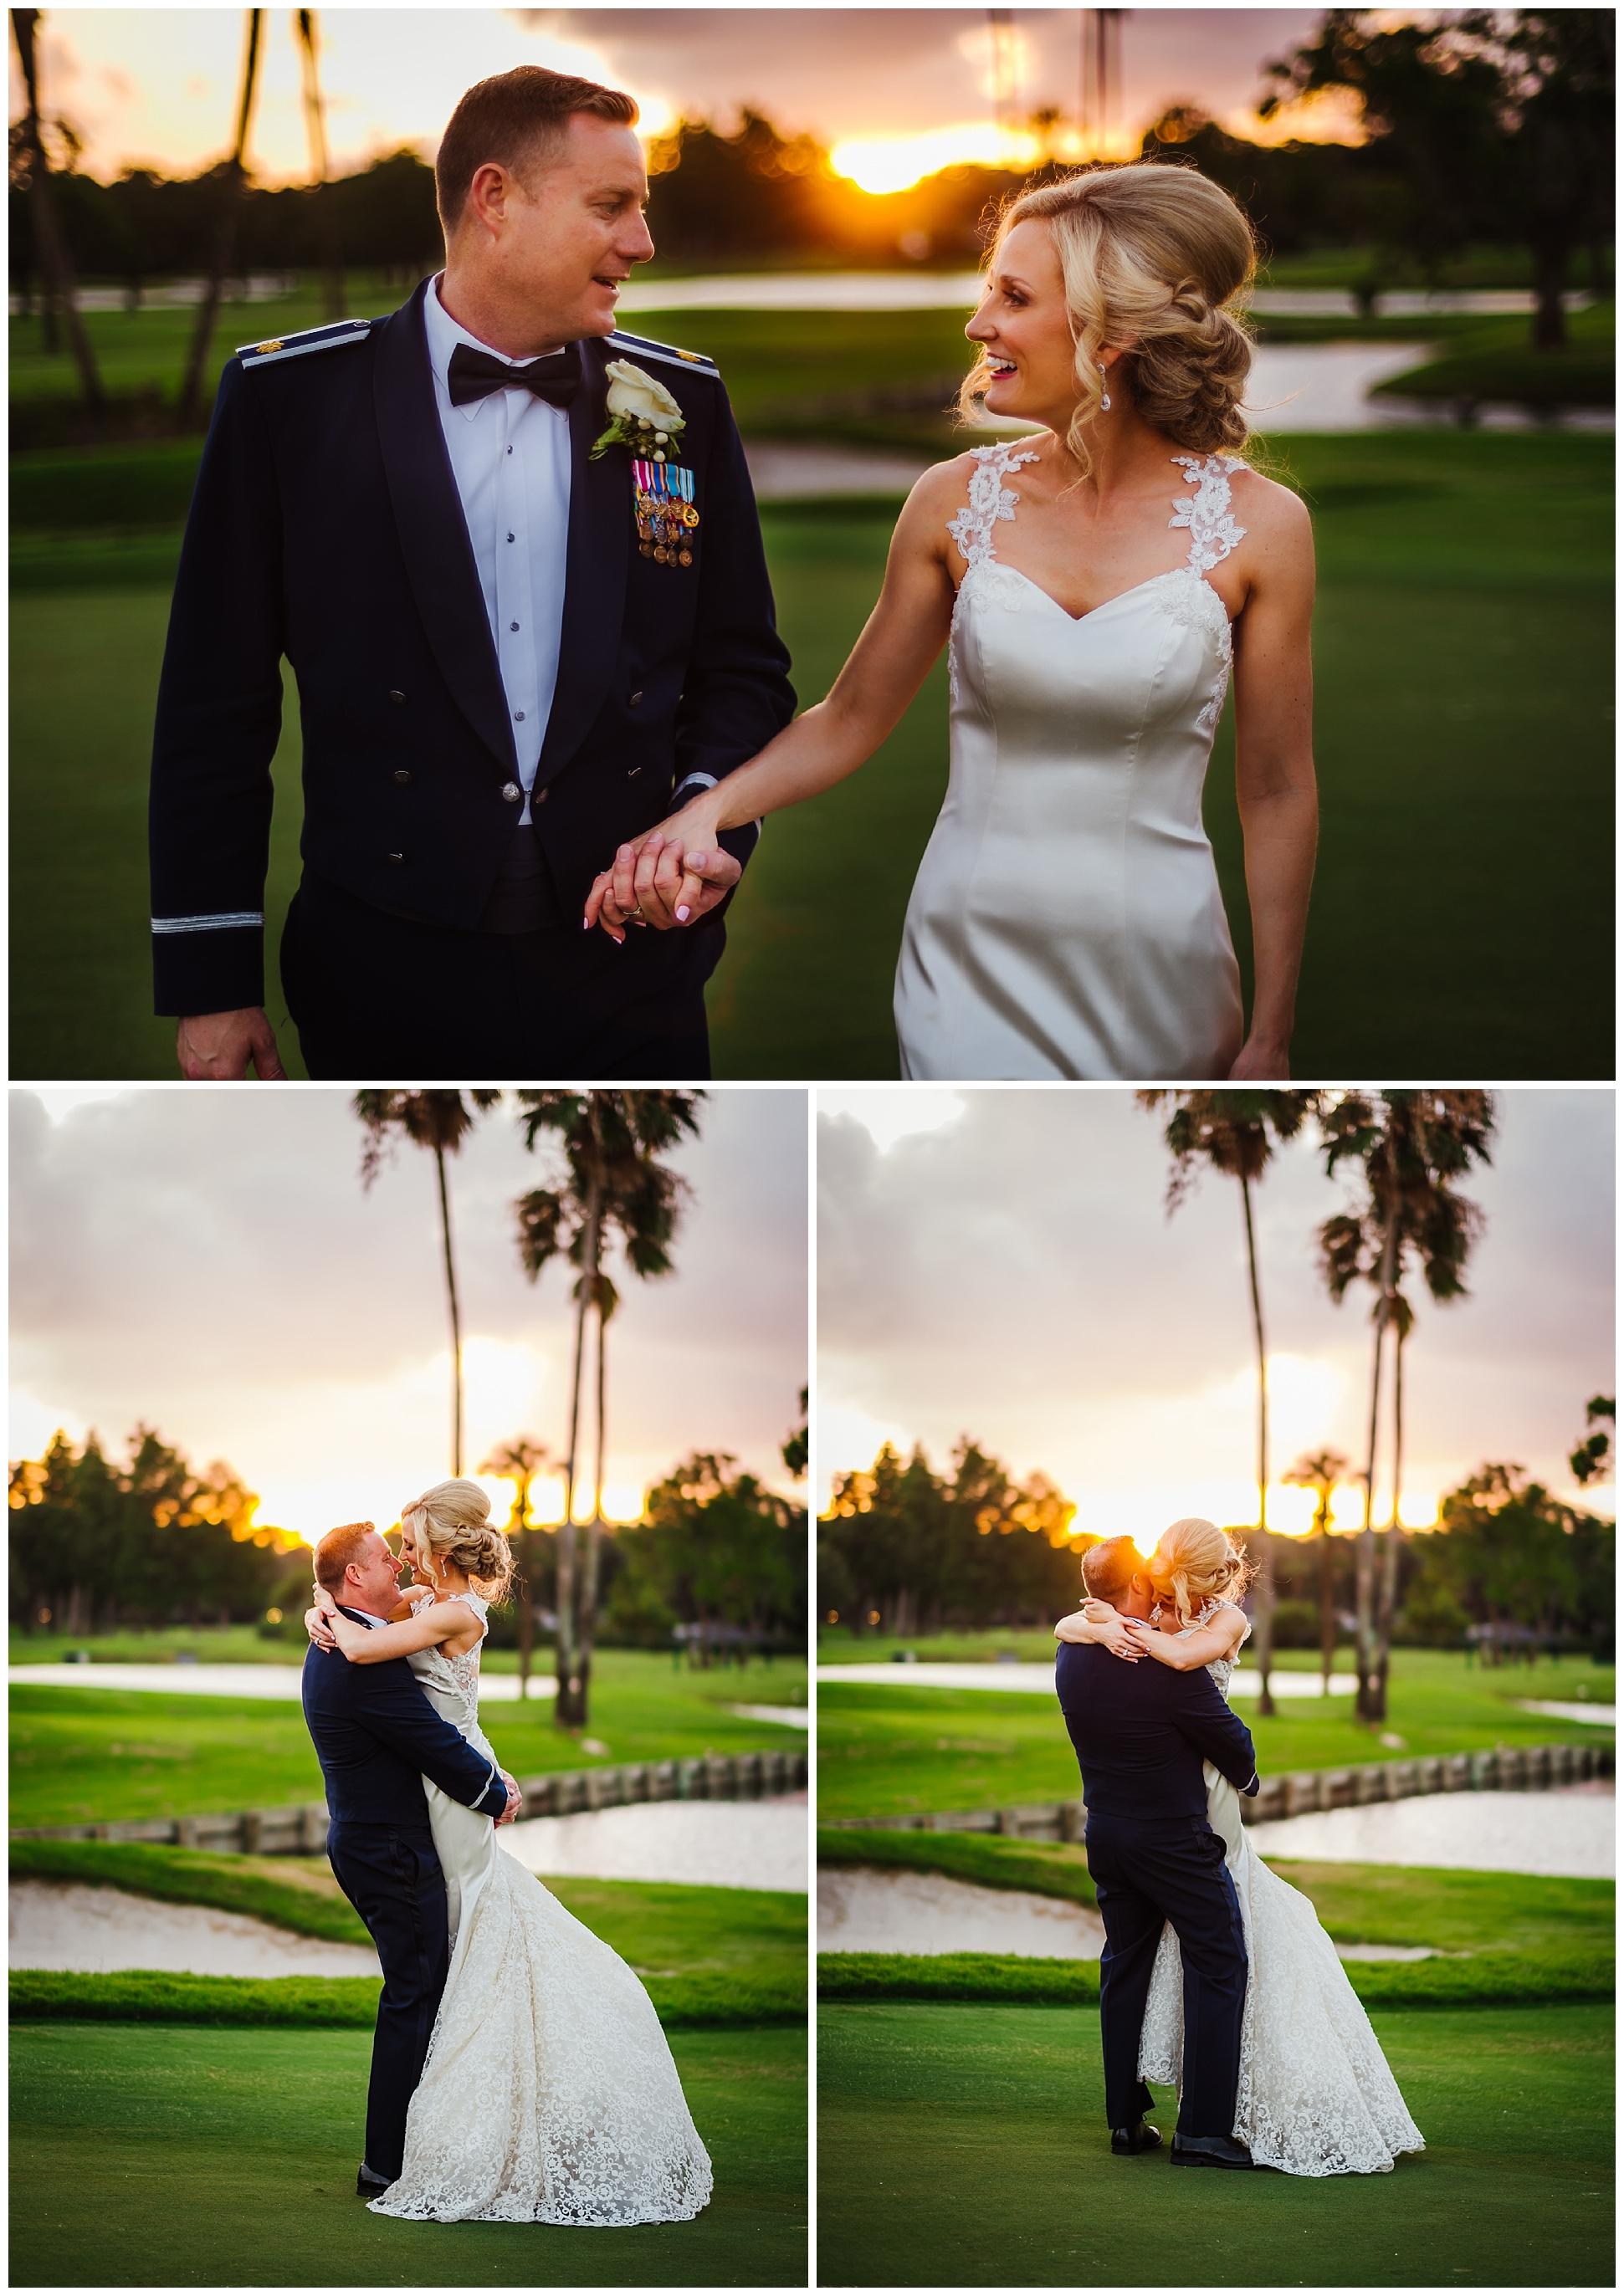 tampa-wedding-photographer-sleeves-palma-ceia-country-club-golf-course-sunset-luxury_0101.jpg